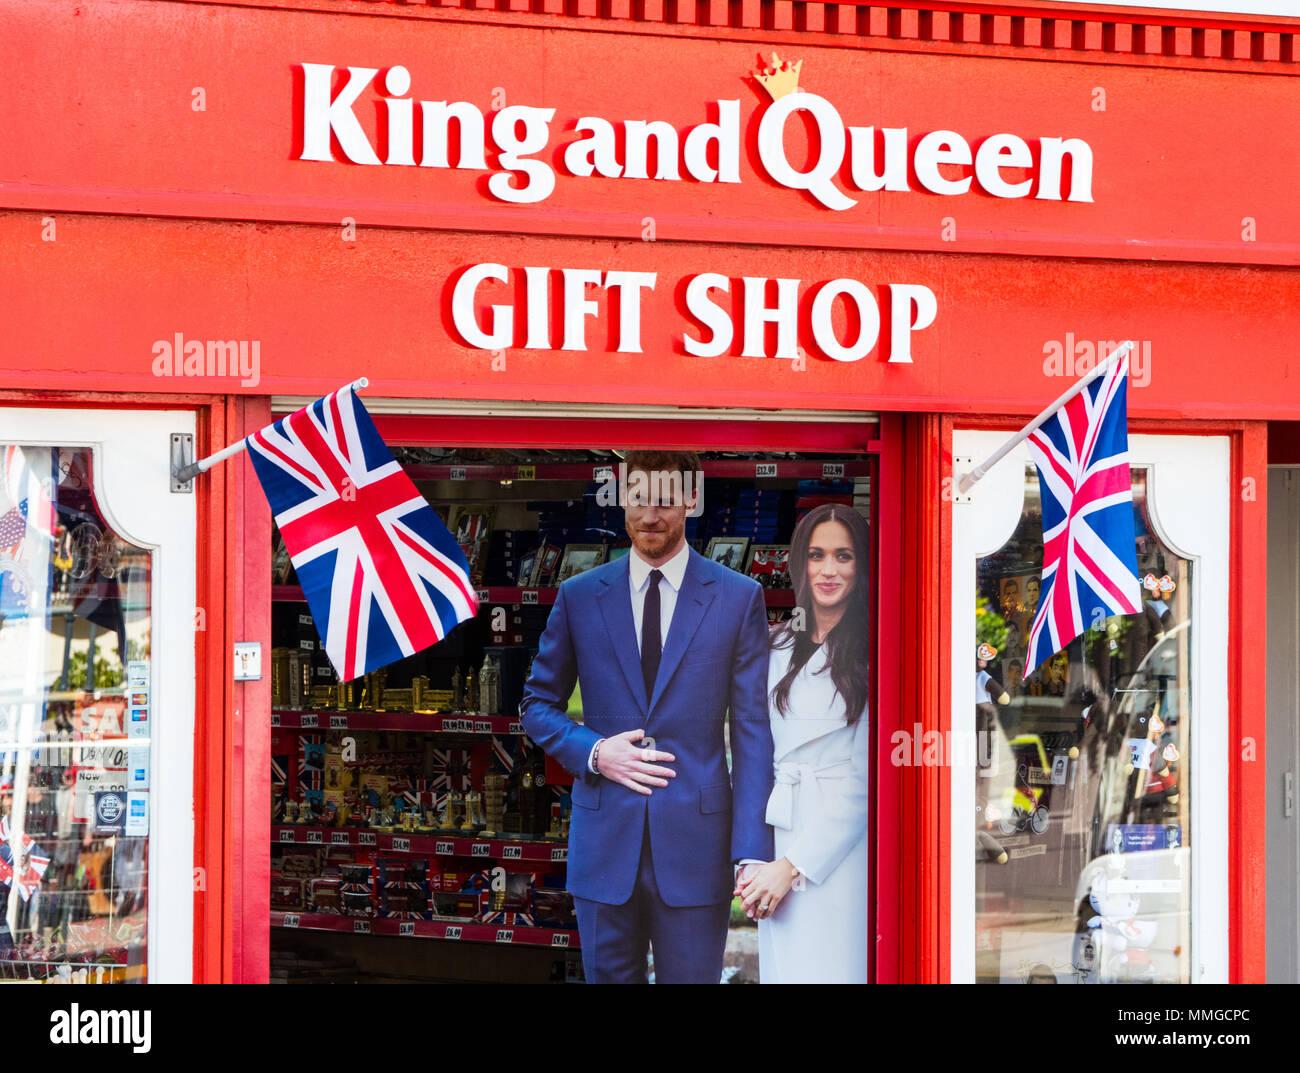 Wedding Shop Uk Stockfotos & Wedding Shop Uk Bilder - Seite 2 - Alamy